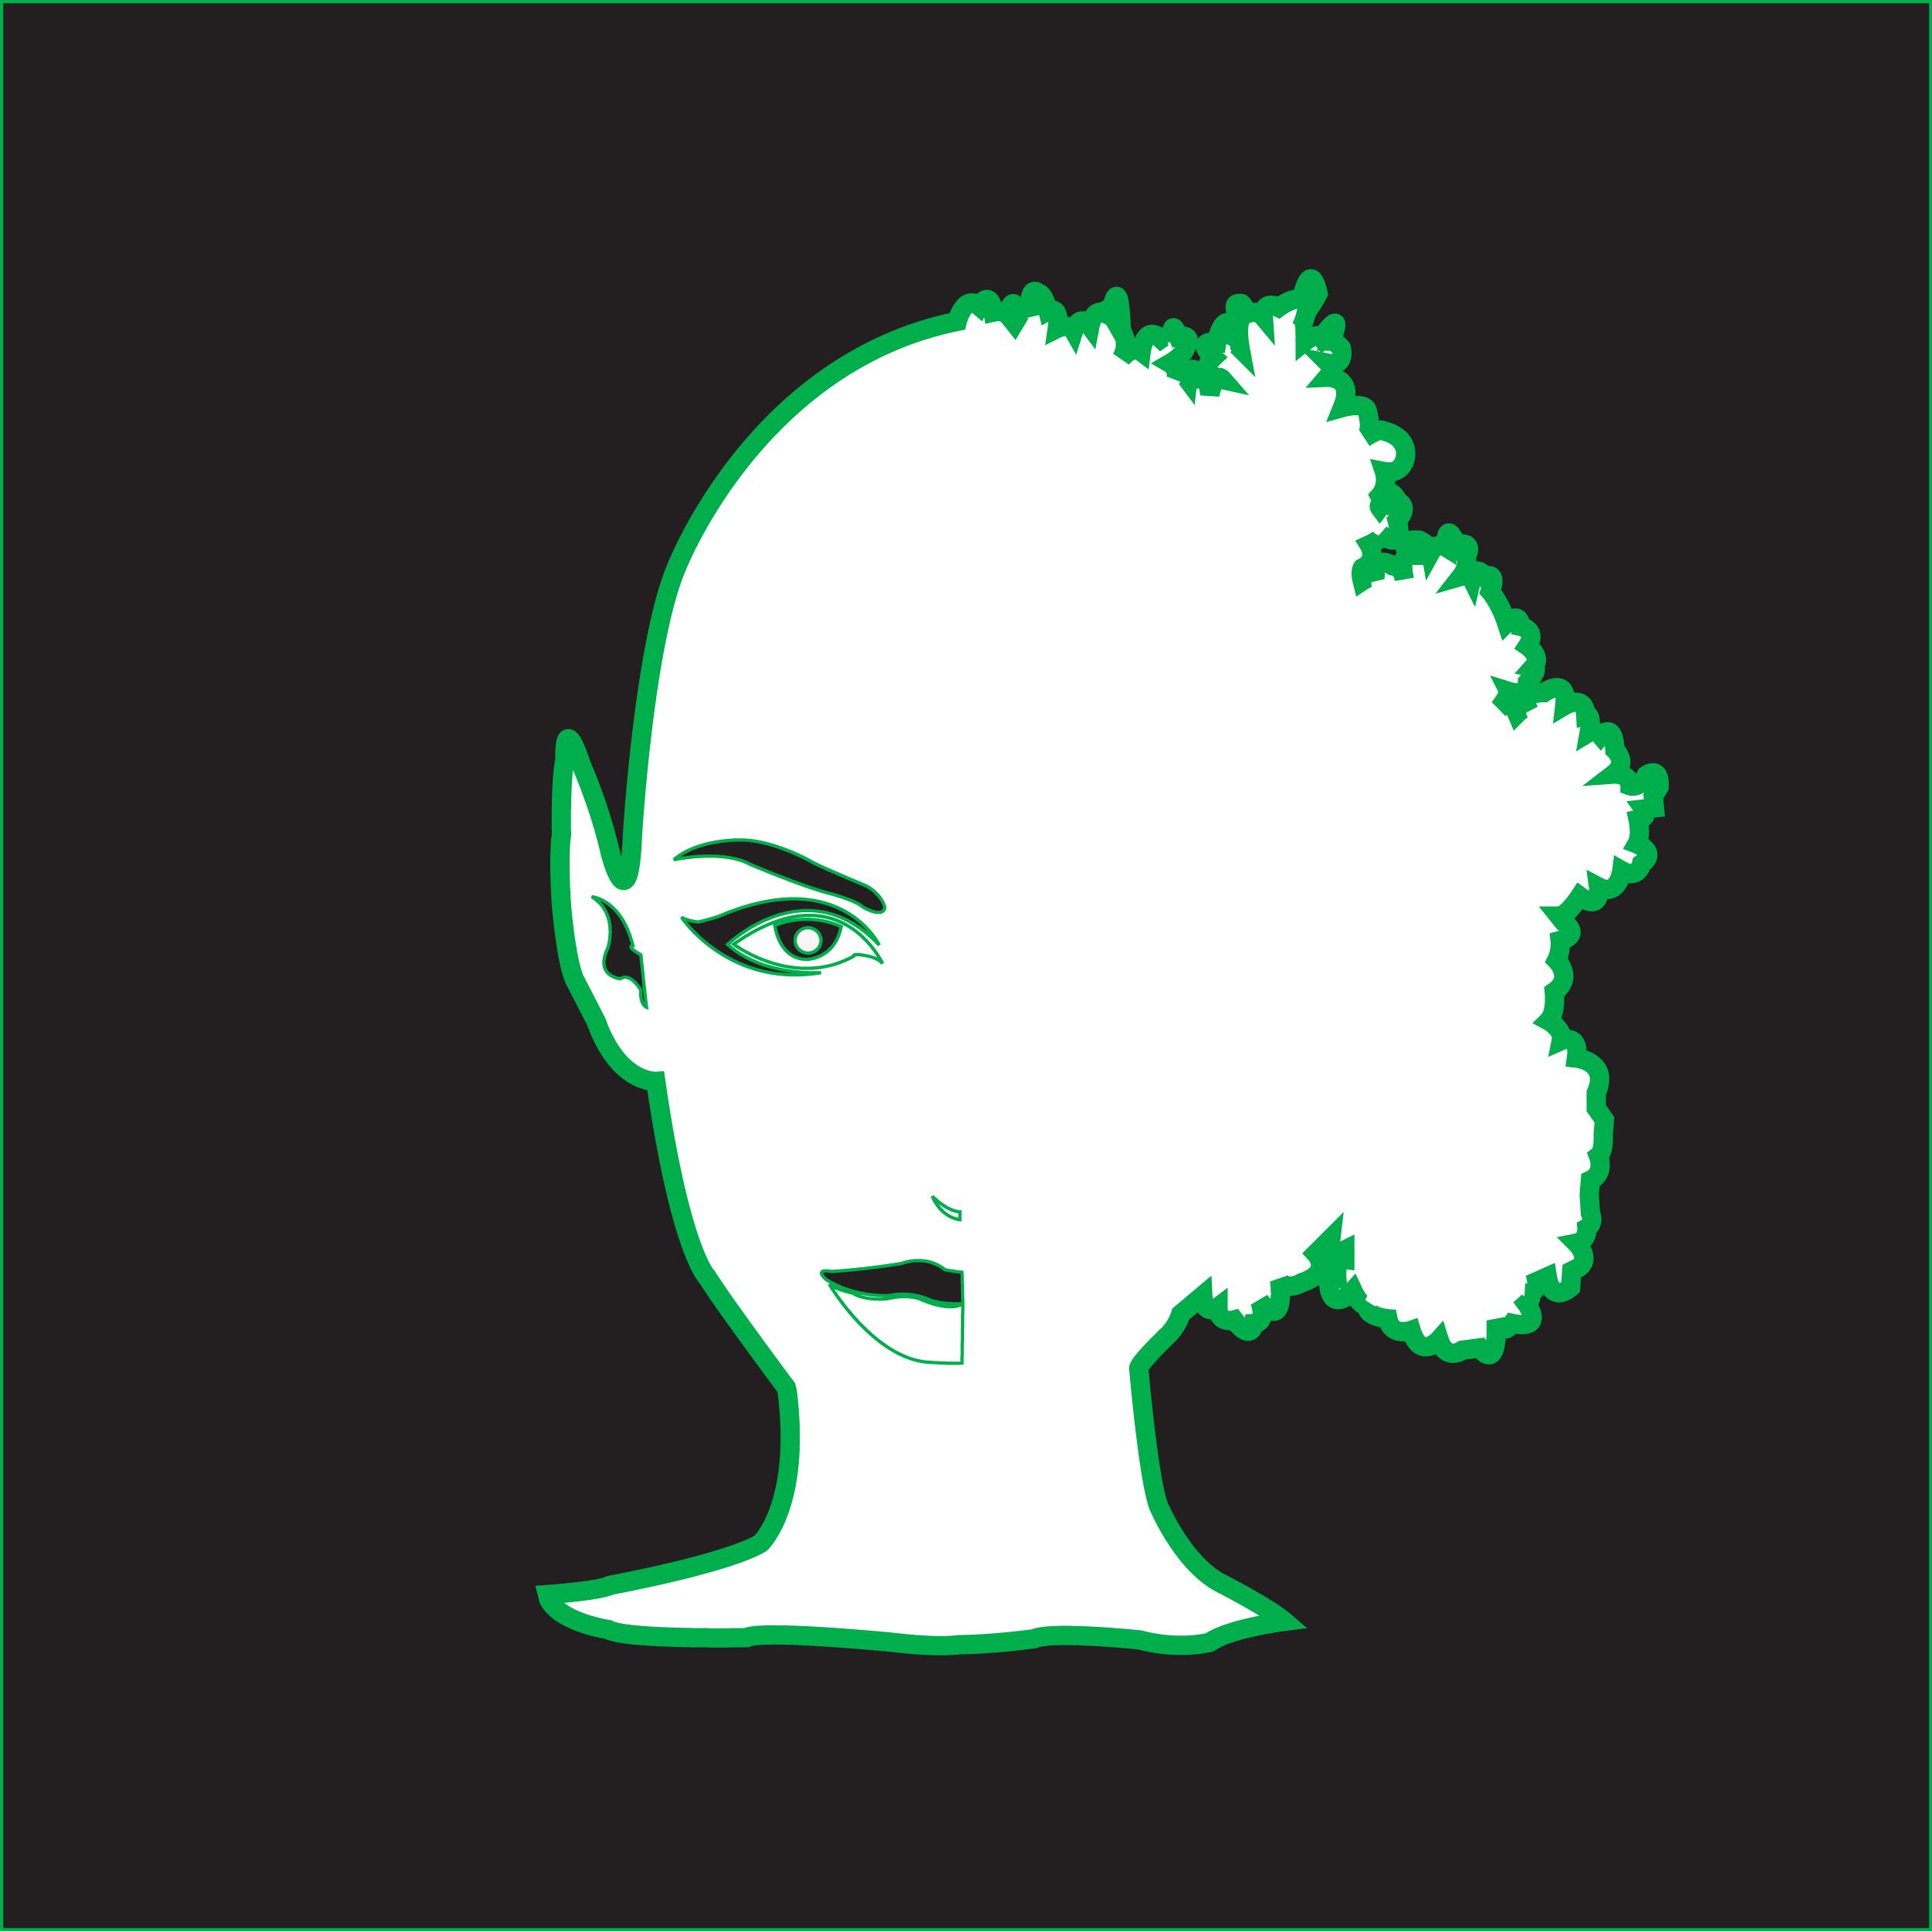 Logo Design by robken0174 - Entry No. 49 in the Logo Design Contest New Logo Design for Tree Elves.